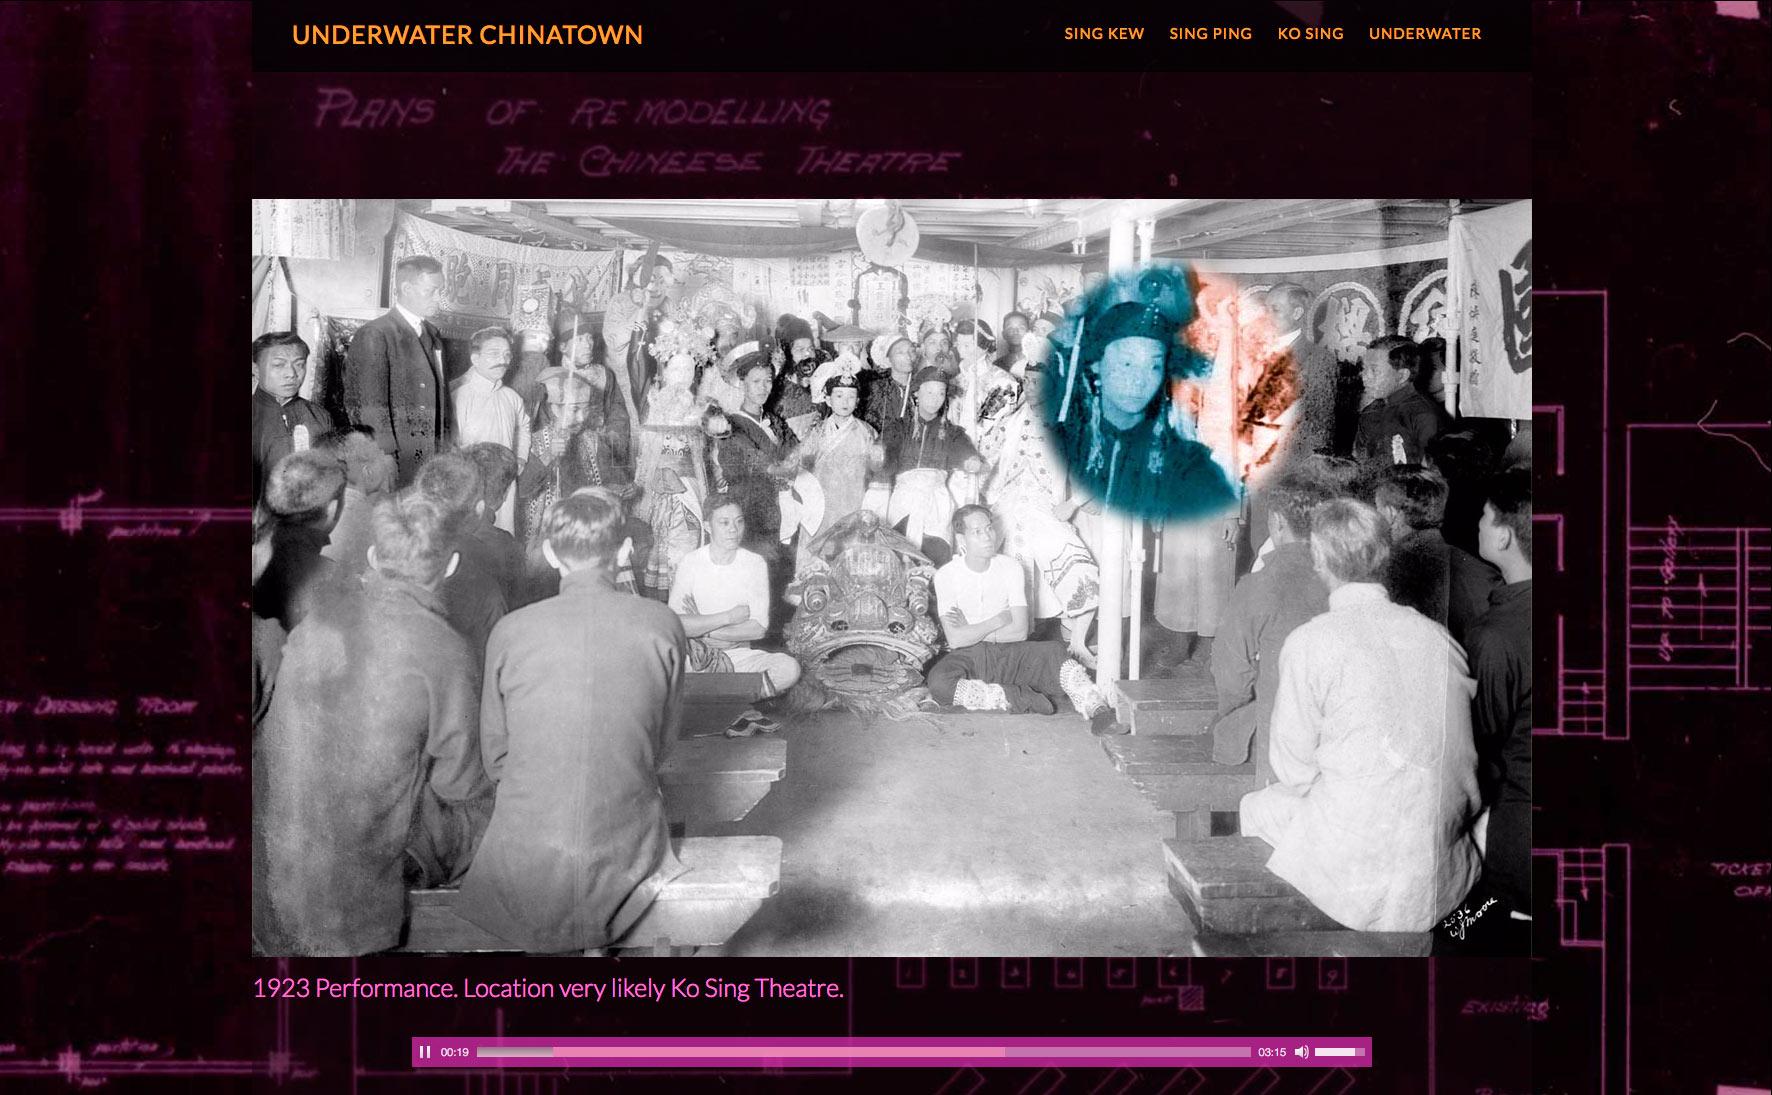 Underwater Chinatown - Sing Ping Evidence